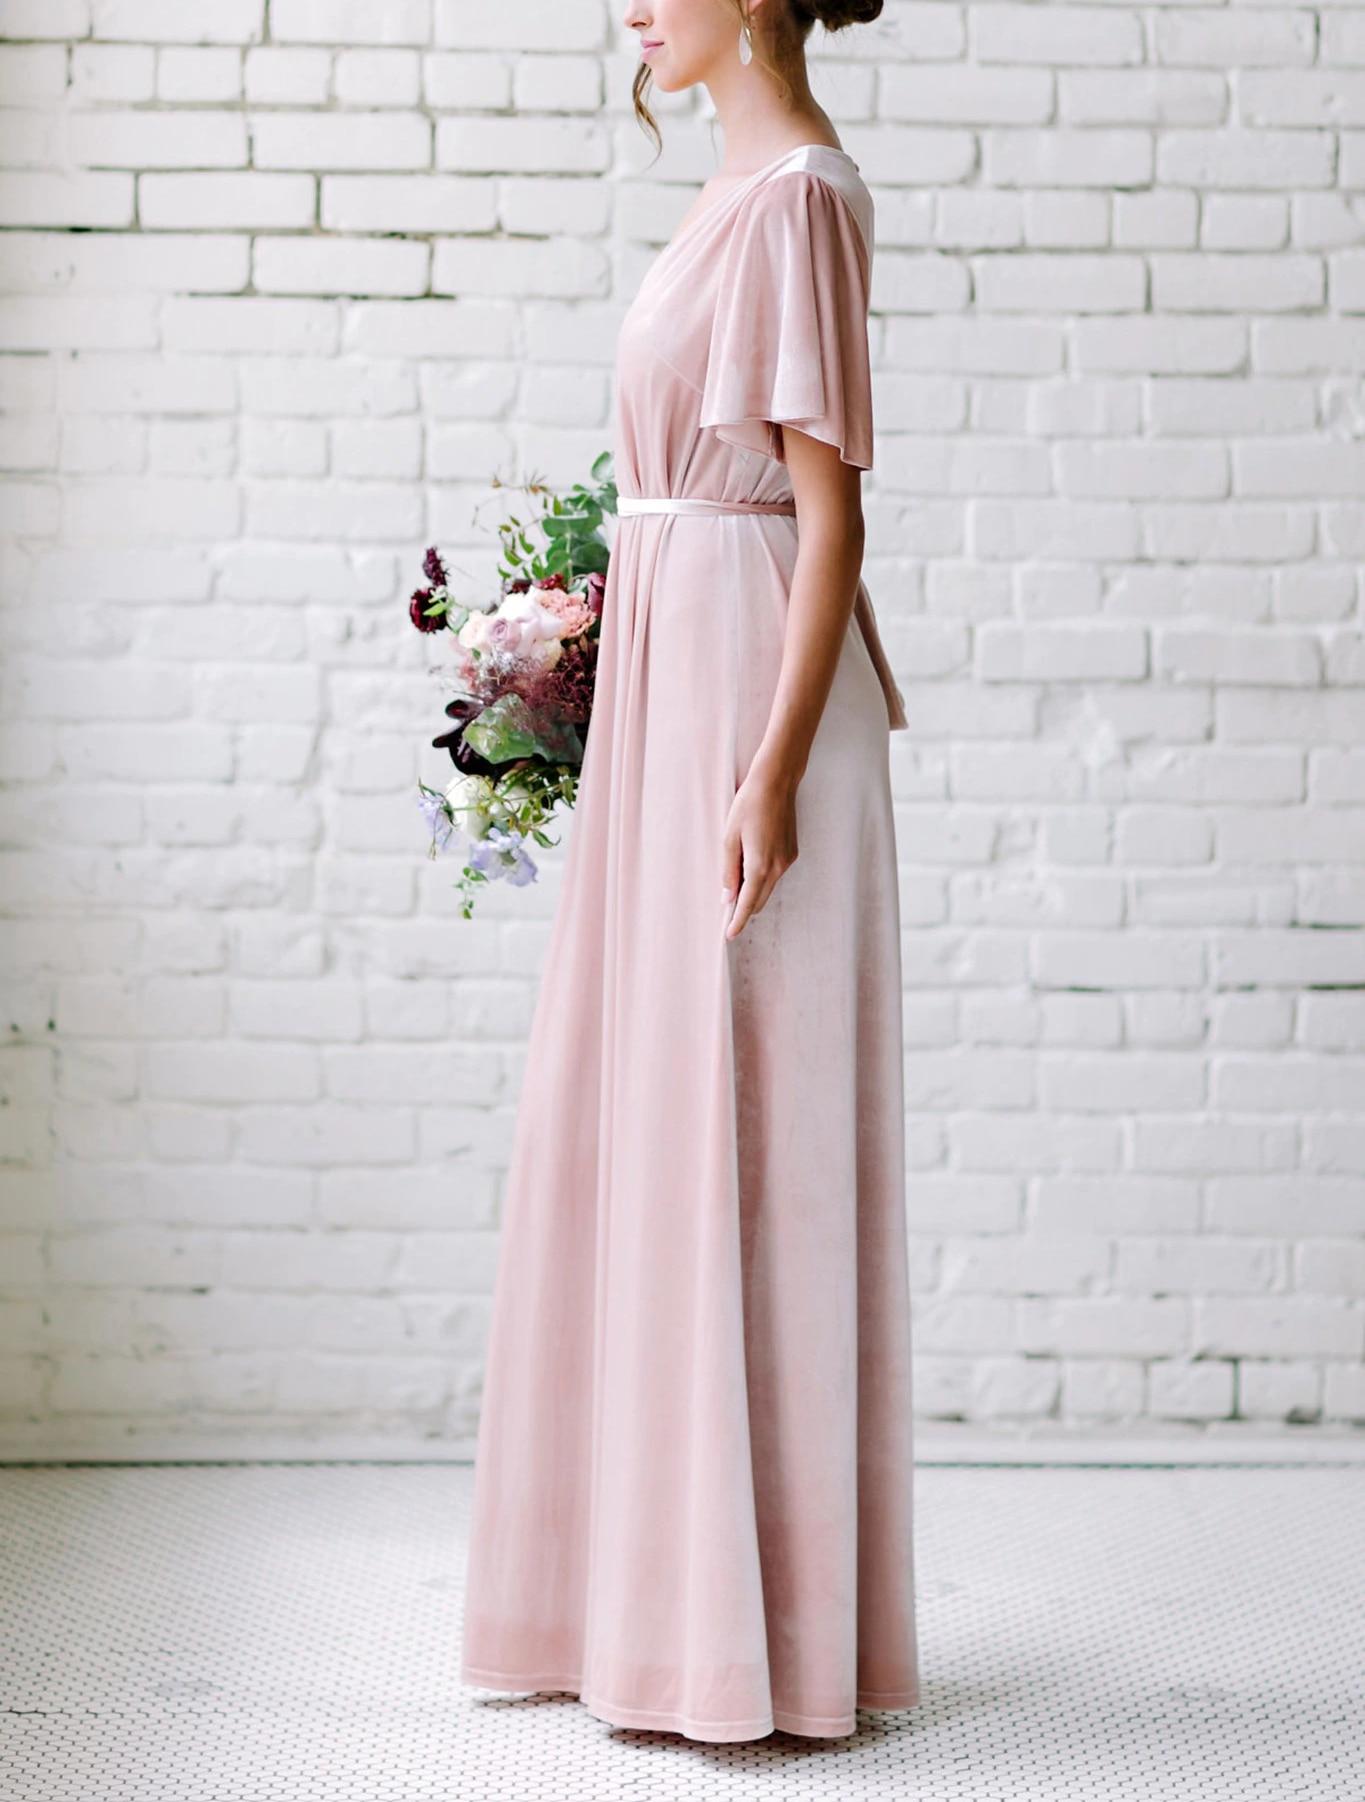 Pink Bridesmaid Dresses Long 2020 Velour Short Sleeves Vestido Madrinha V-Neck Wedding Guest Dress Vestido De Festa